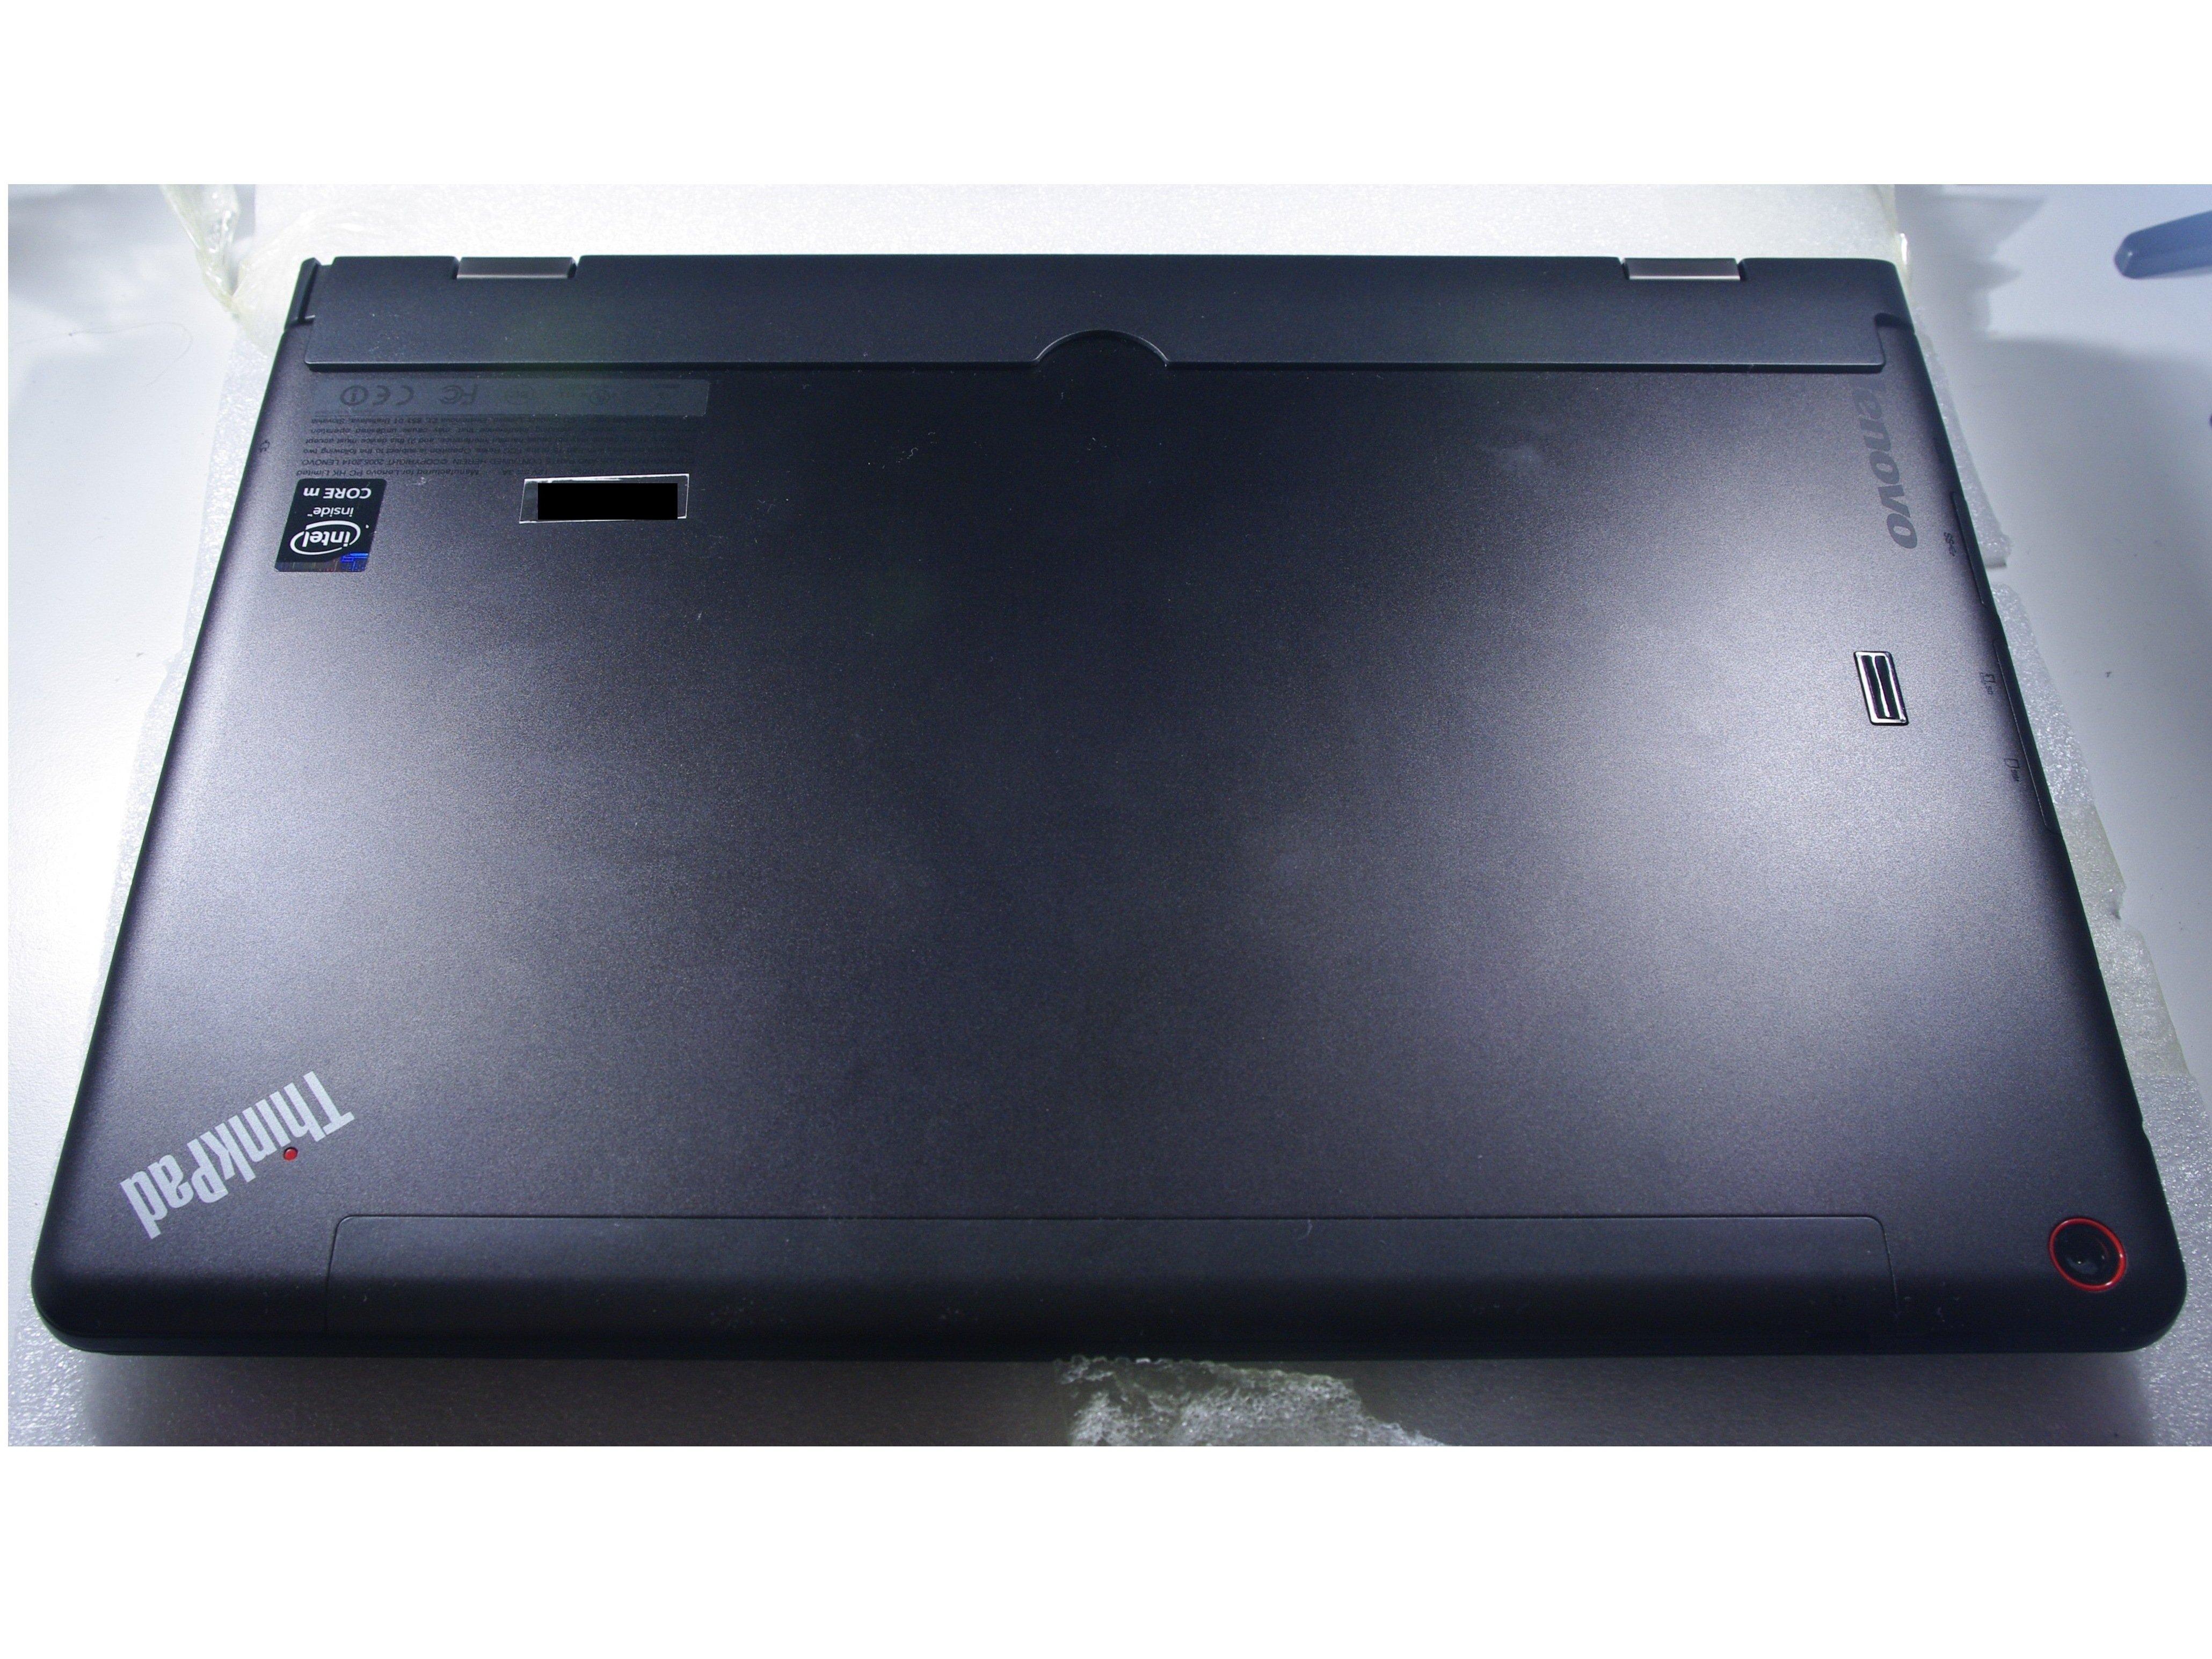 Lenovo Helix 2 Teardown - iFixit